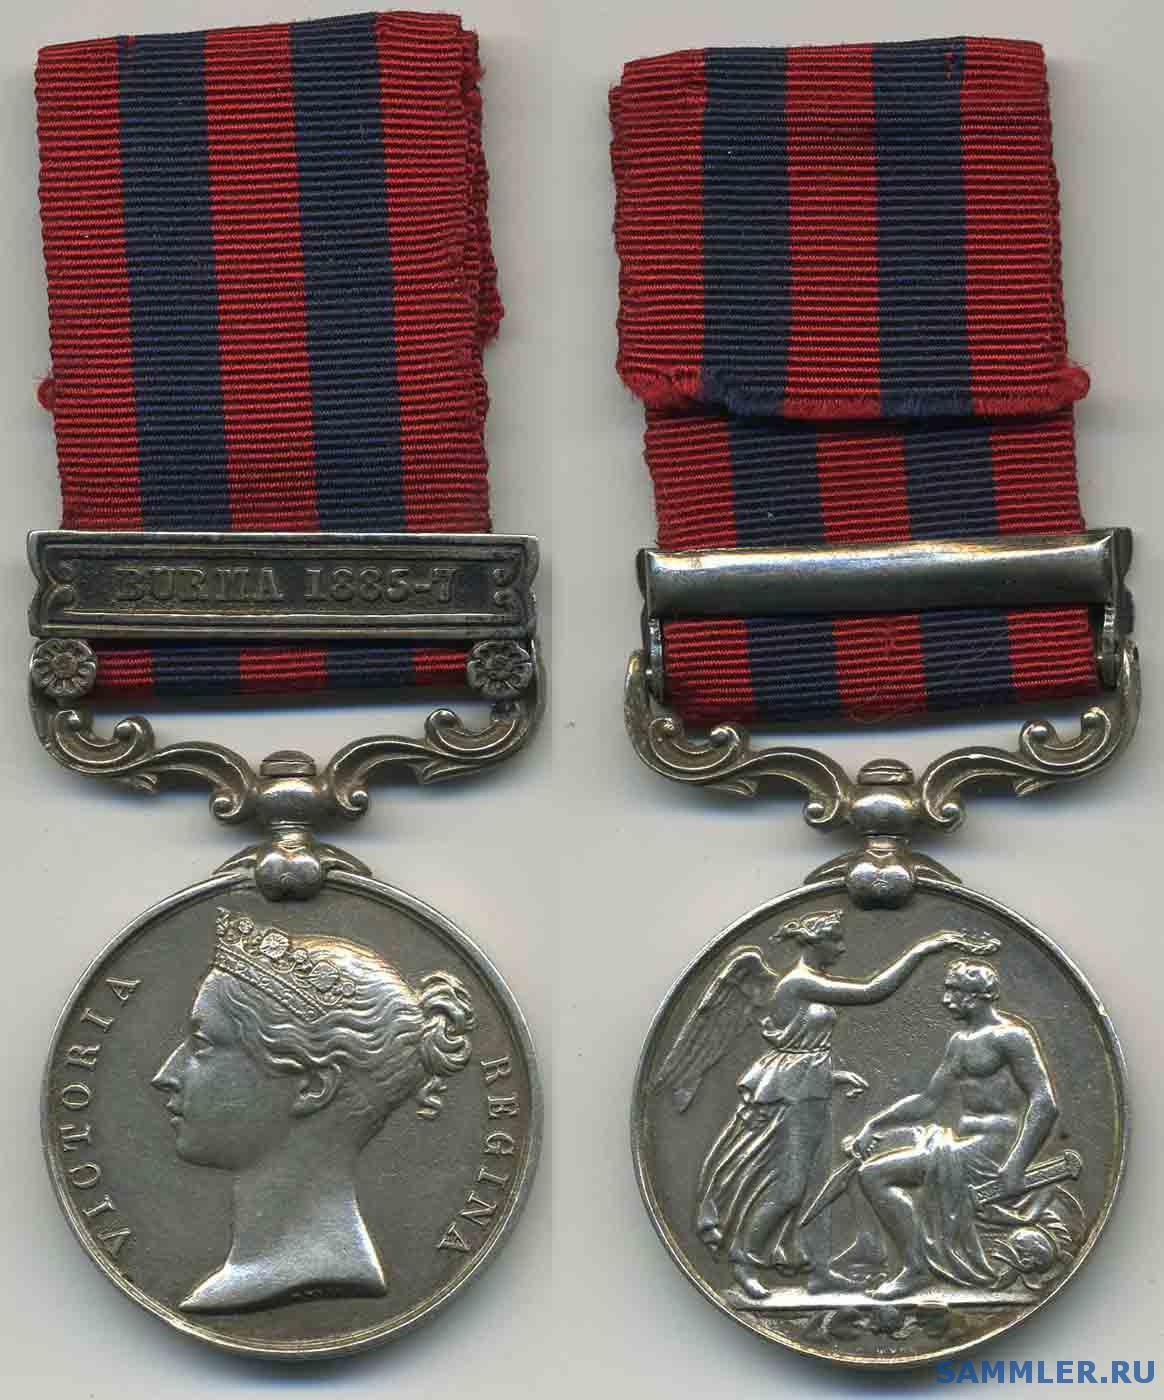 India_General_Service_Medal_1854_95_s_.jpg